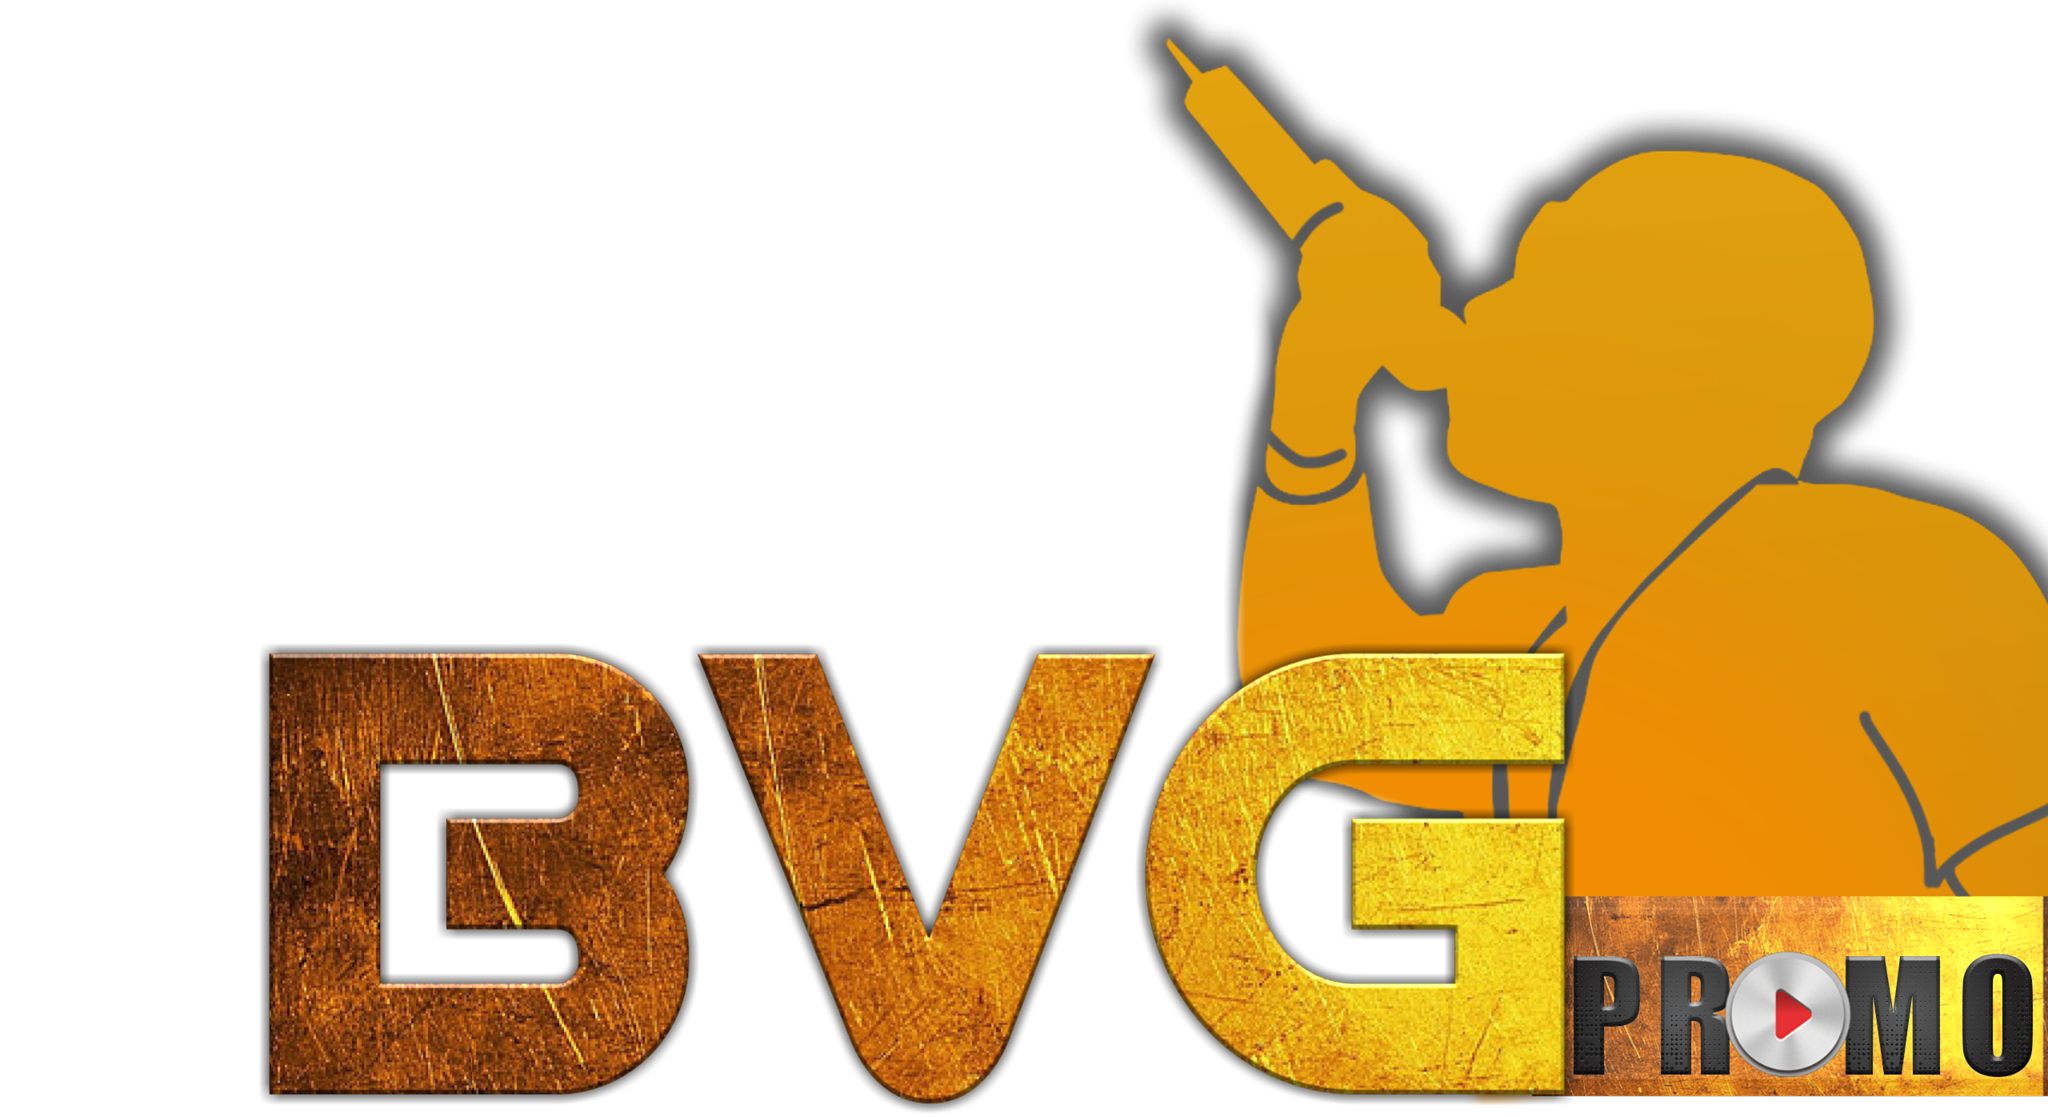 WWW.BVGPROMOHAITI.COM